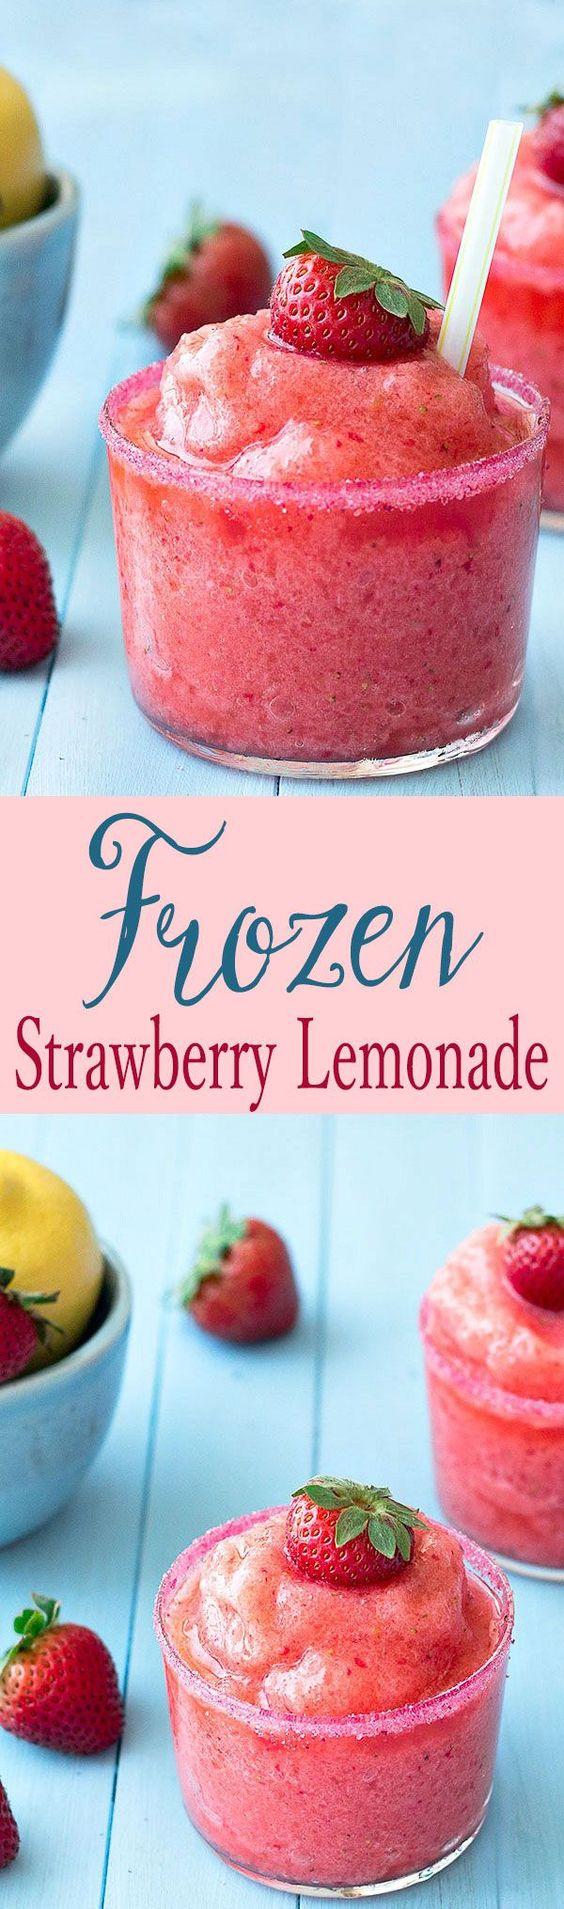 This frozen strawberry lemonade is so easy to make, full of fresh strawberries and tart lemons - the perfect refreshment for the summer!